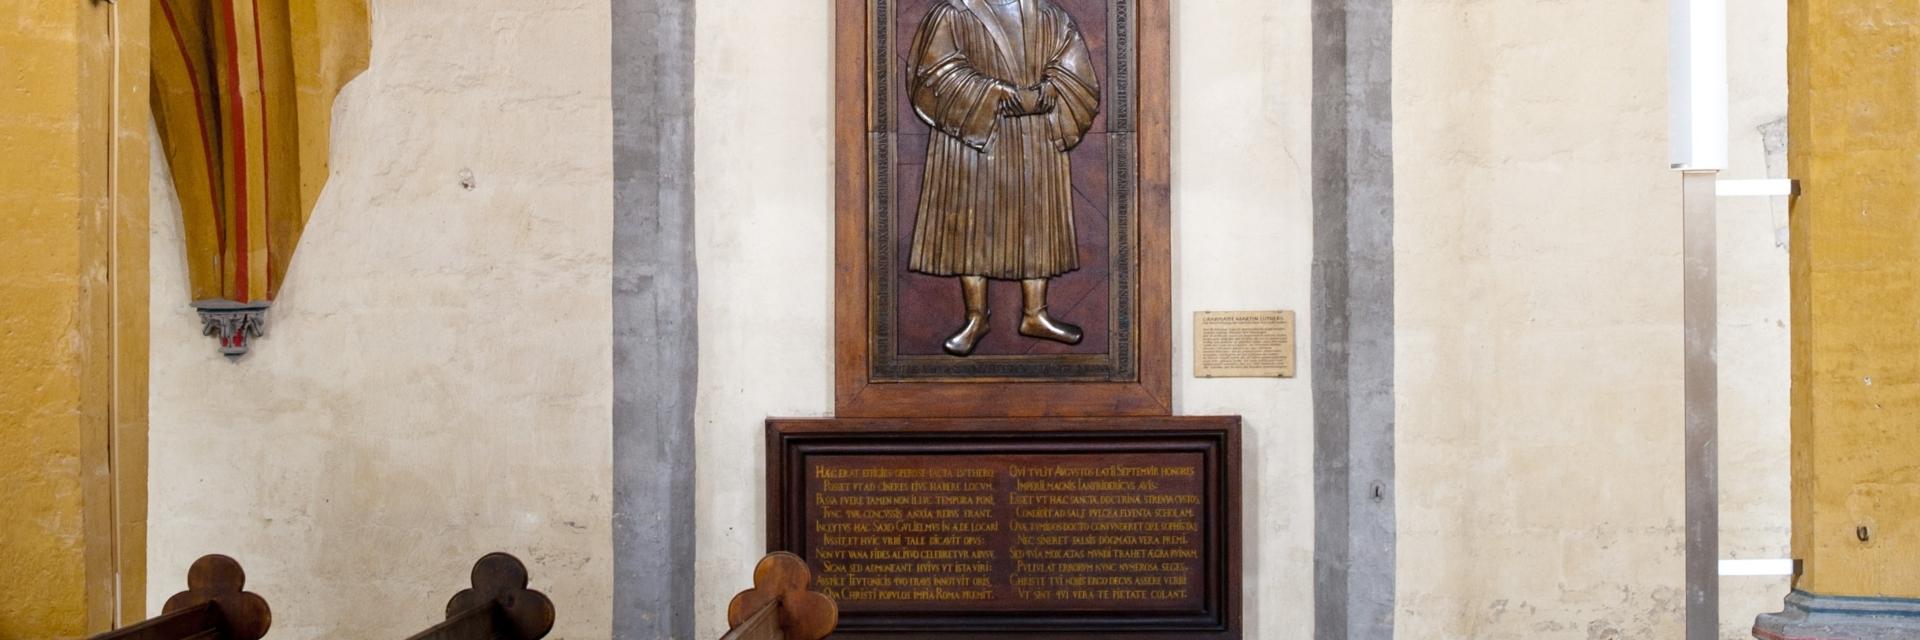 Martin Luther und die Reformation in Jena / Grabplatte © JenaKultur, Foto: Andreas Hub